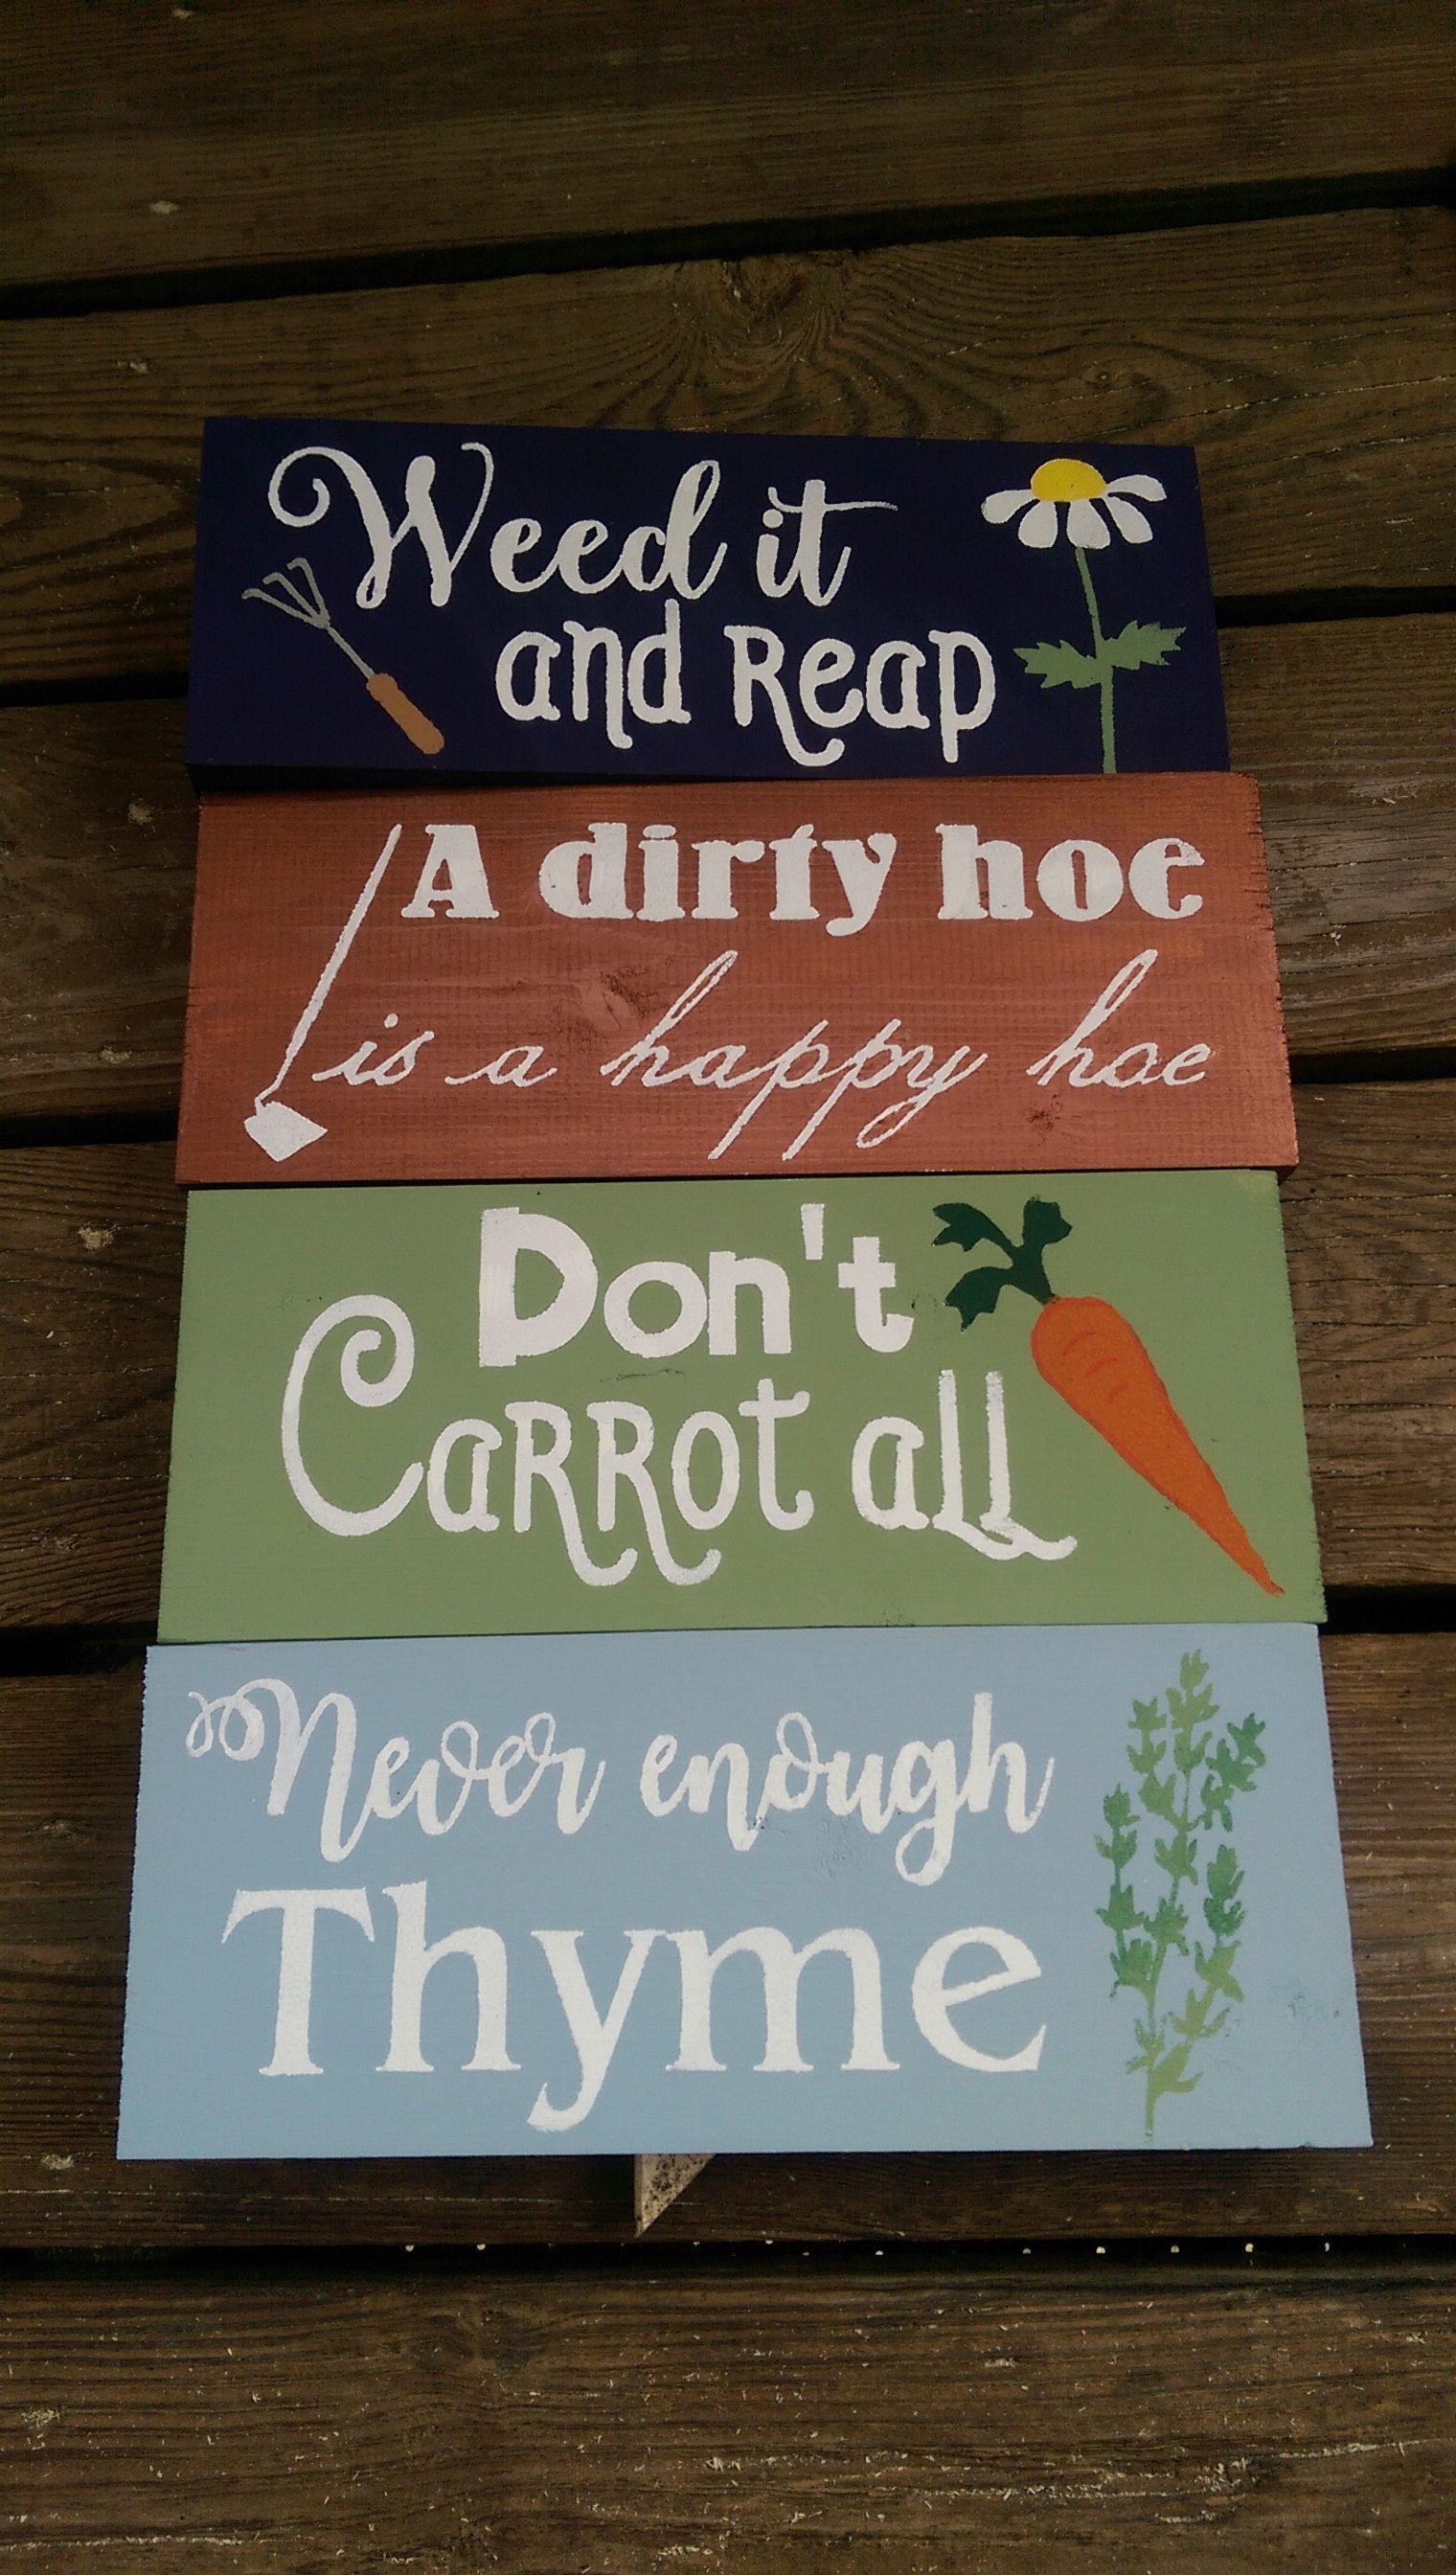 Fun With Garden Puns Https Www Etsy Com Shop Greenchickens Ref Seller Platform Mcnav Search Query Garden Pun With Images Garden Puns Fun Novelty Sign